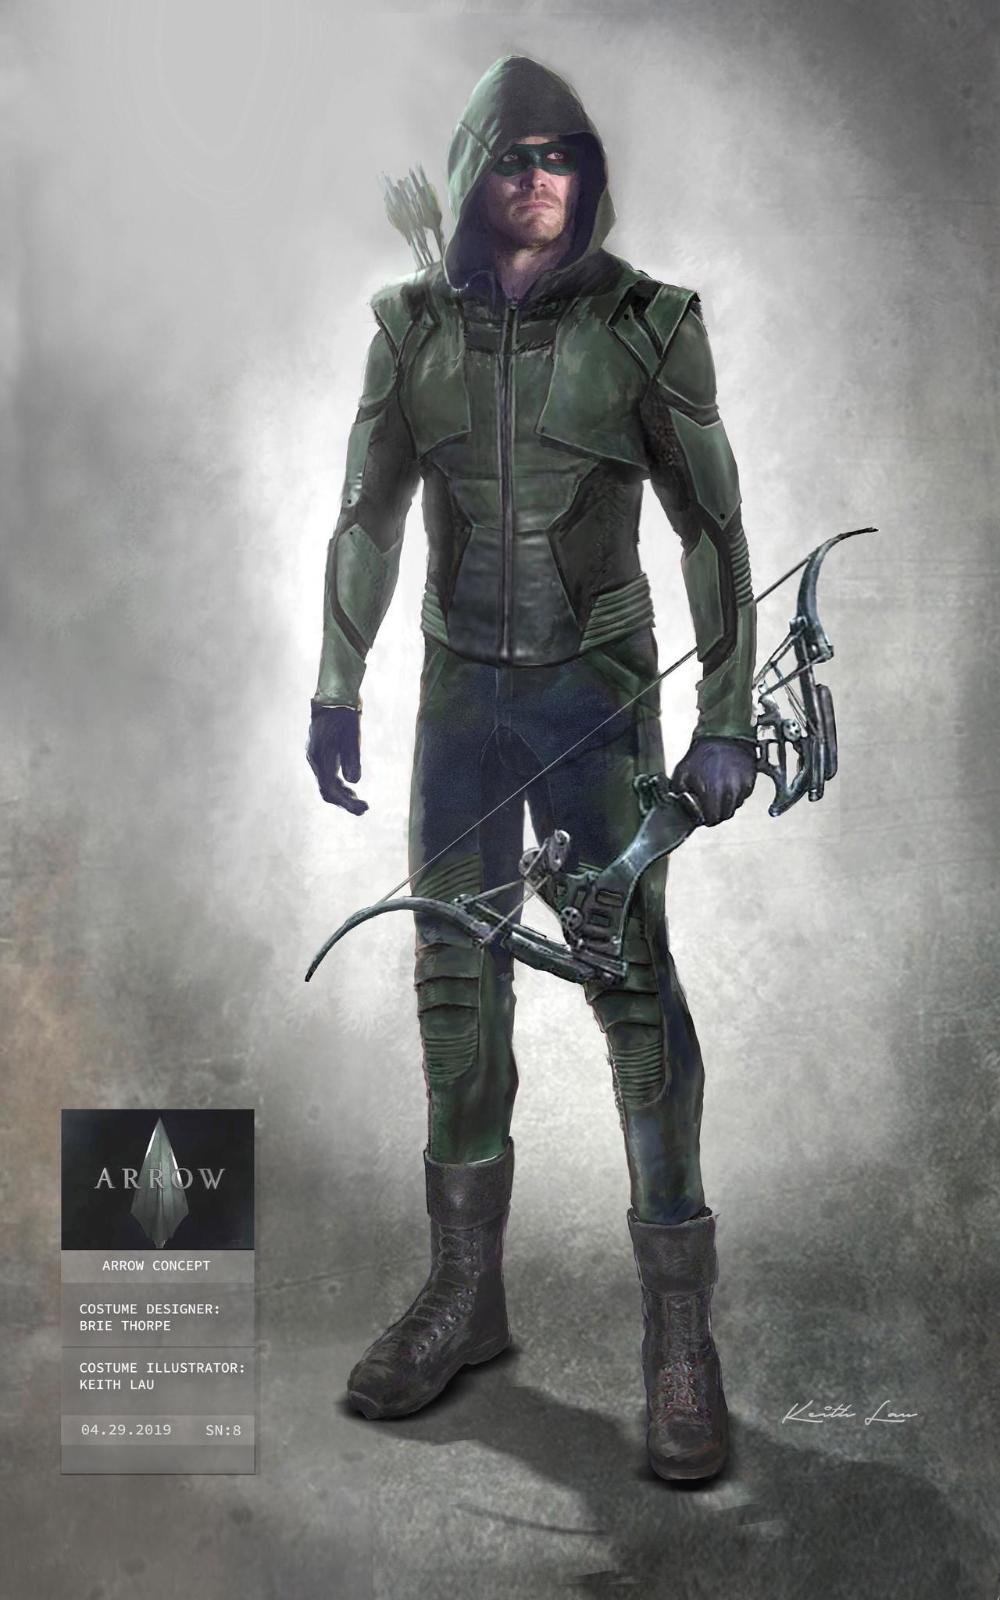 Official Arrow S8 Green Arrow Suit Concept Art By Artlover67 On Deviantart In 2020 Green Arrow Cosplay Green Arrow Tv Green Arrow